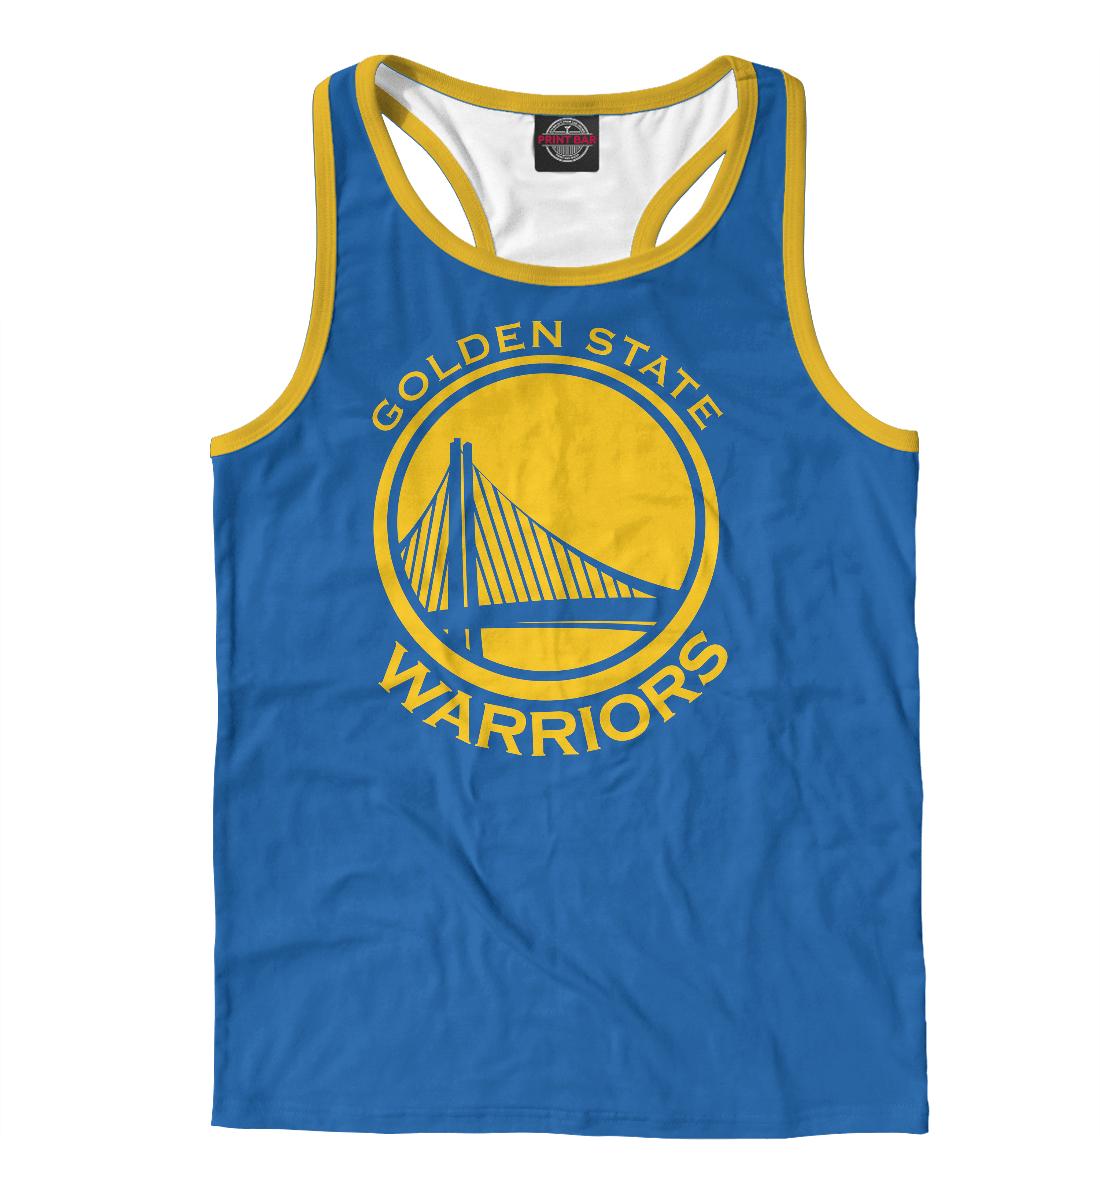 Купить Golden State Warriors, Printbar, Майки борцовки, NBA-677168-mayb-2